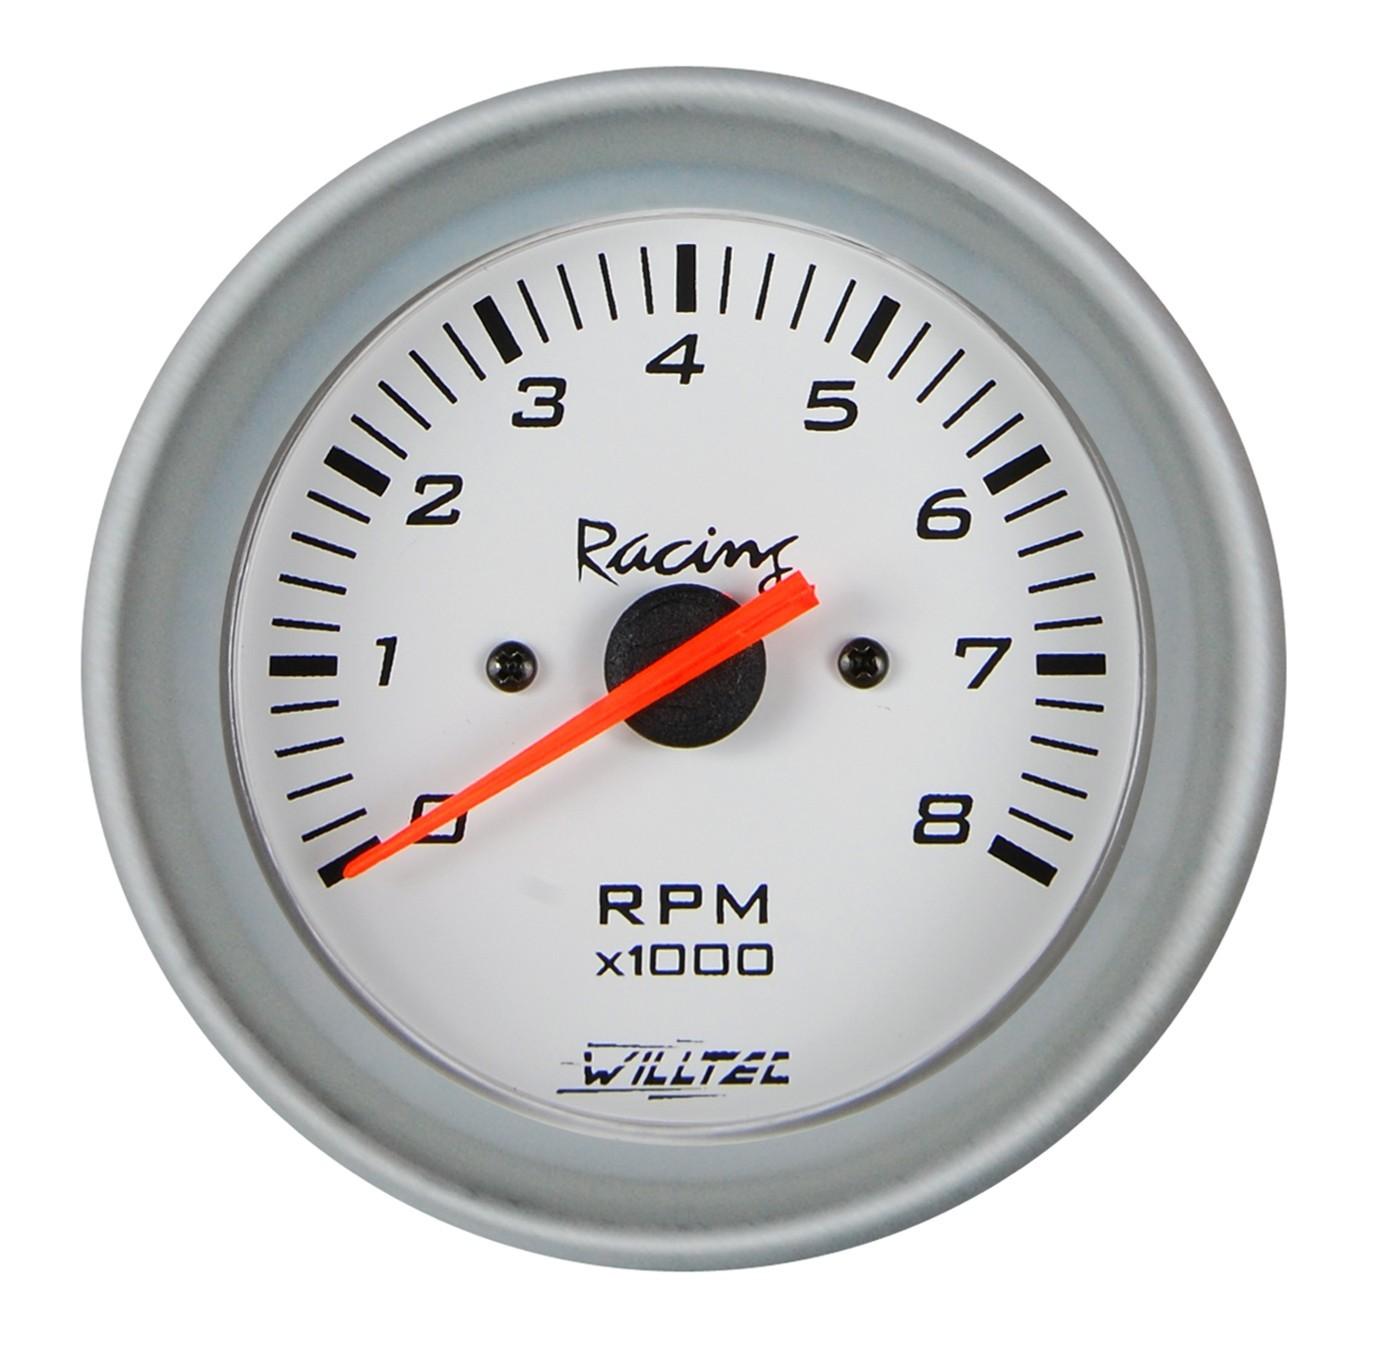 Tacômetro universal